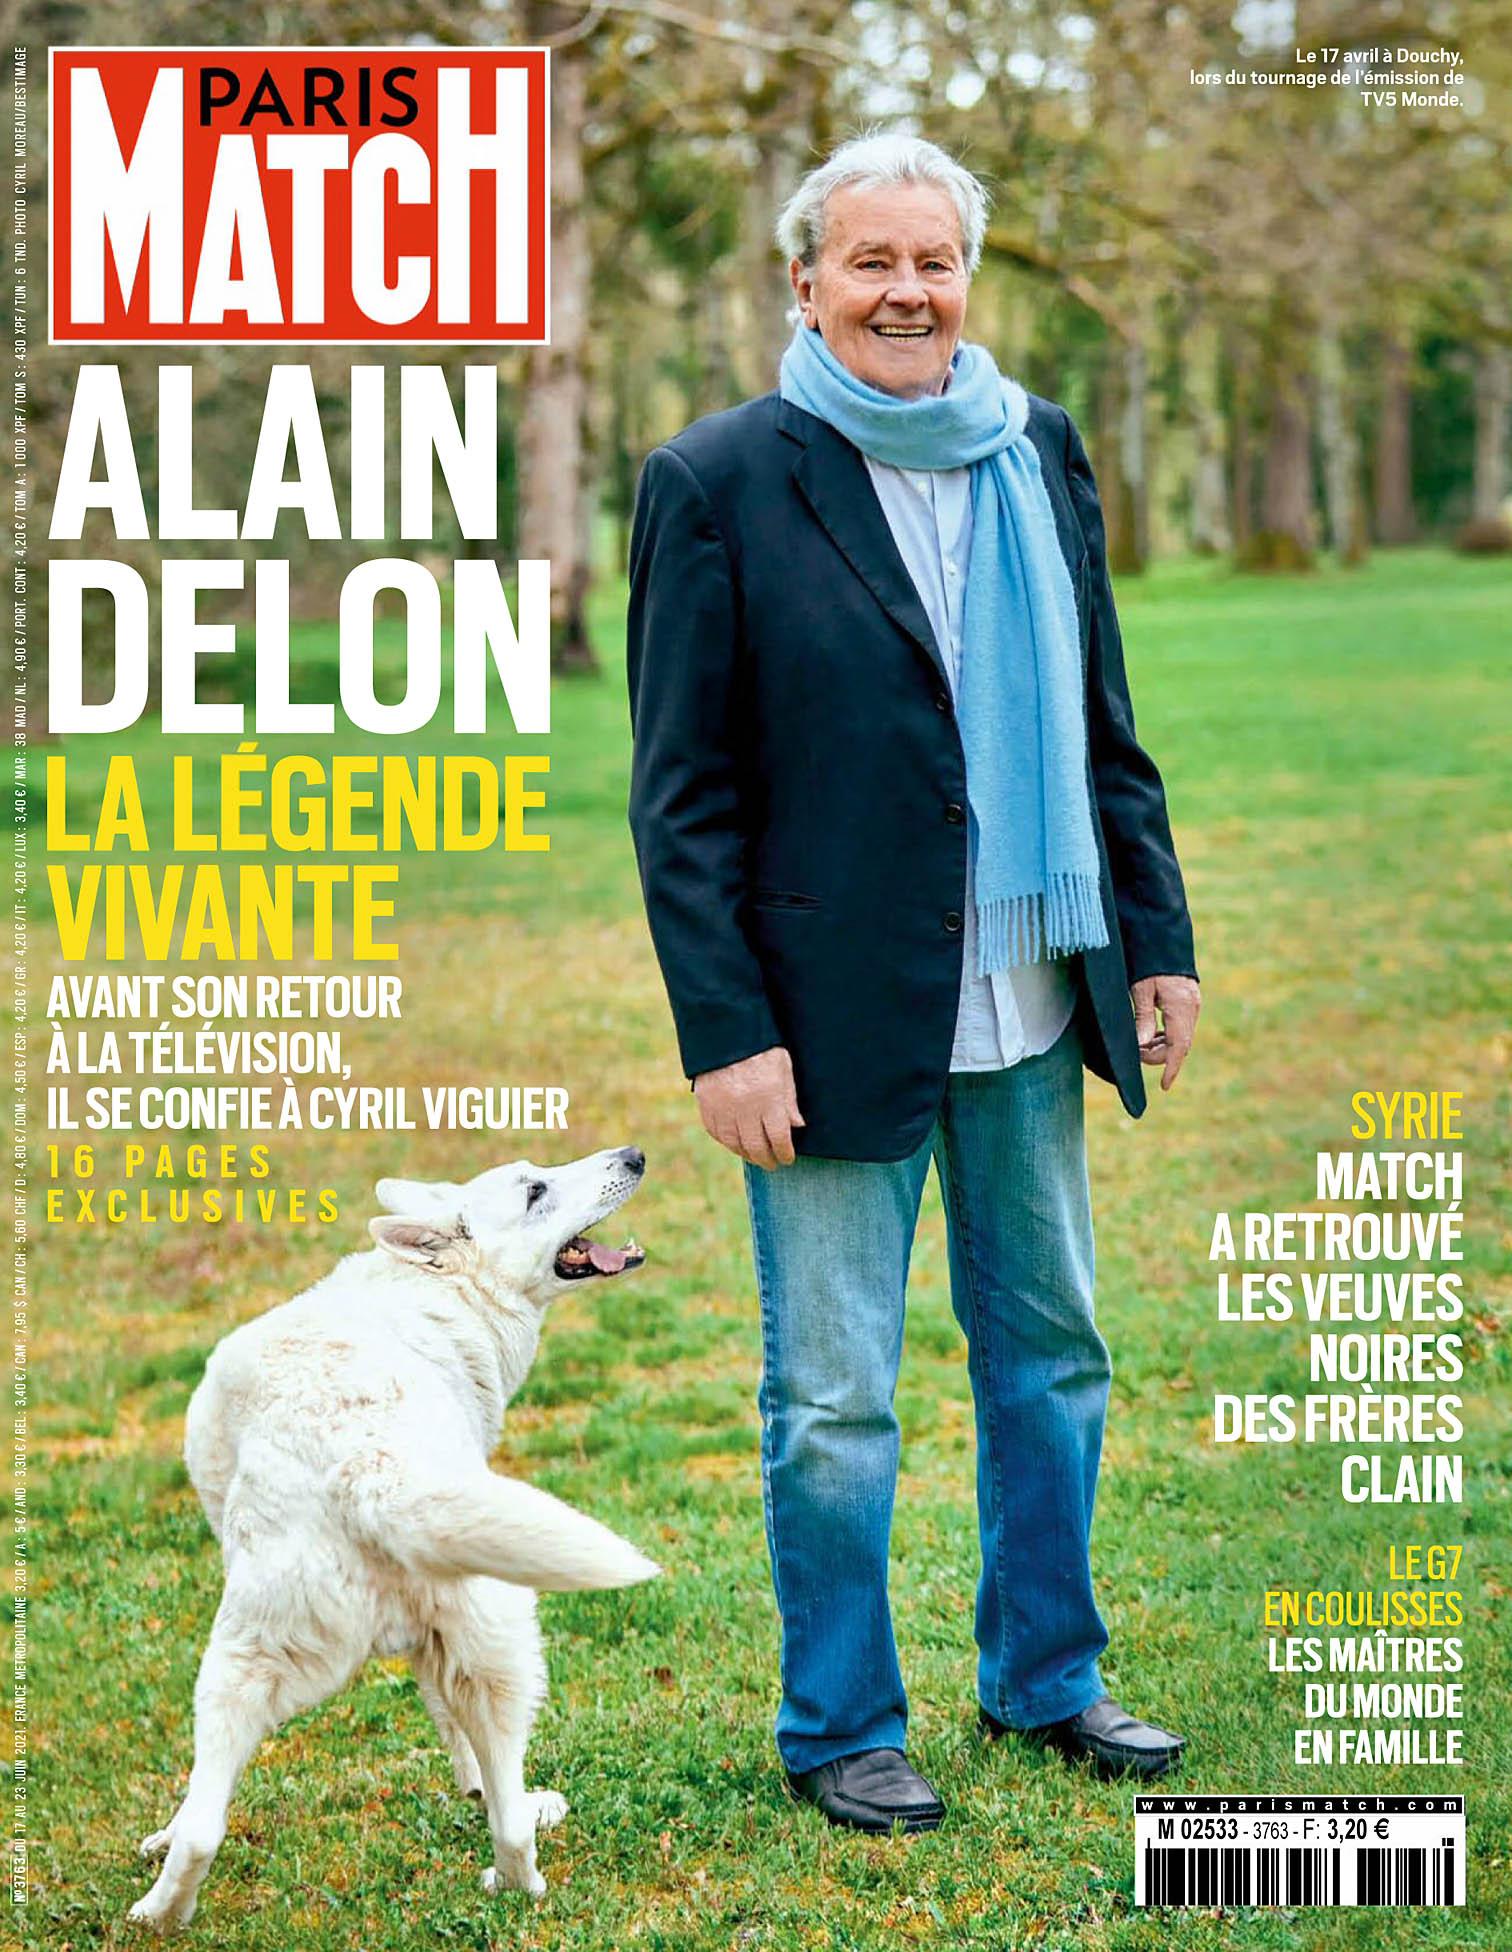 Paris Match 210617 ADelon 01.jpg